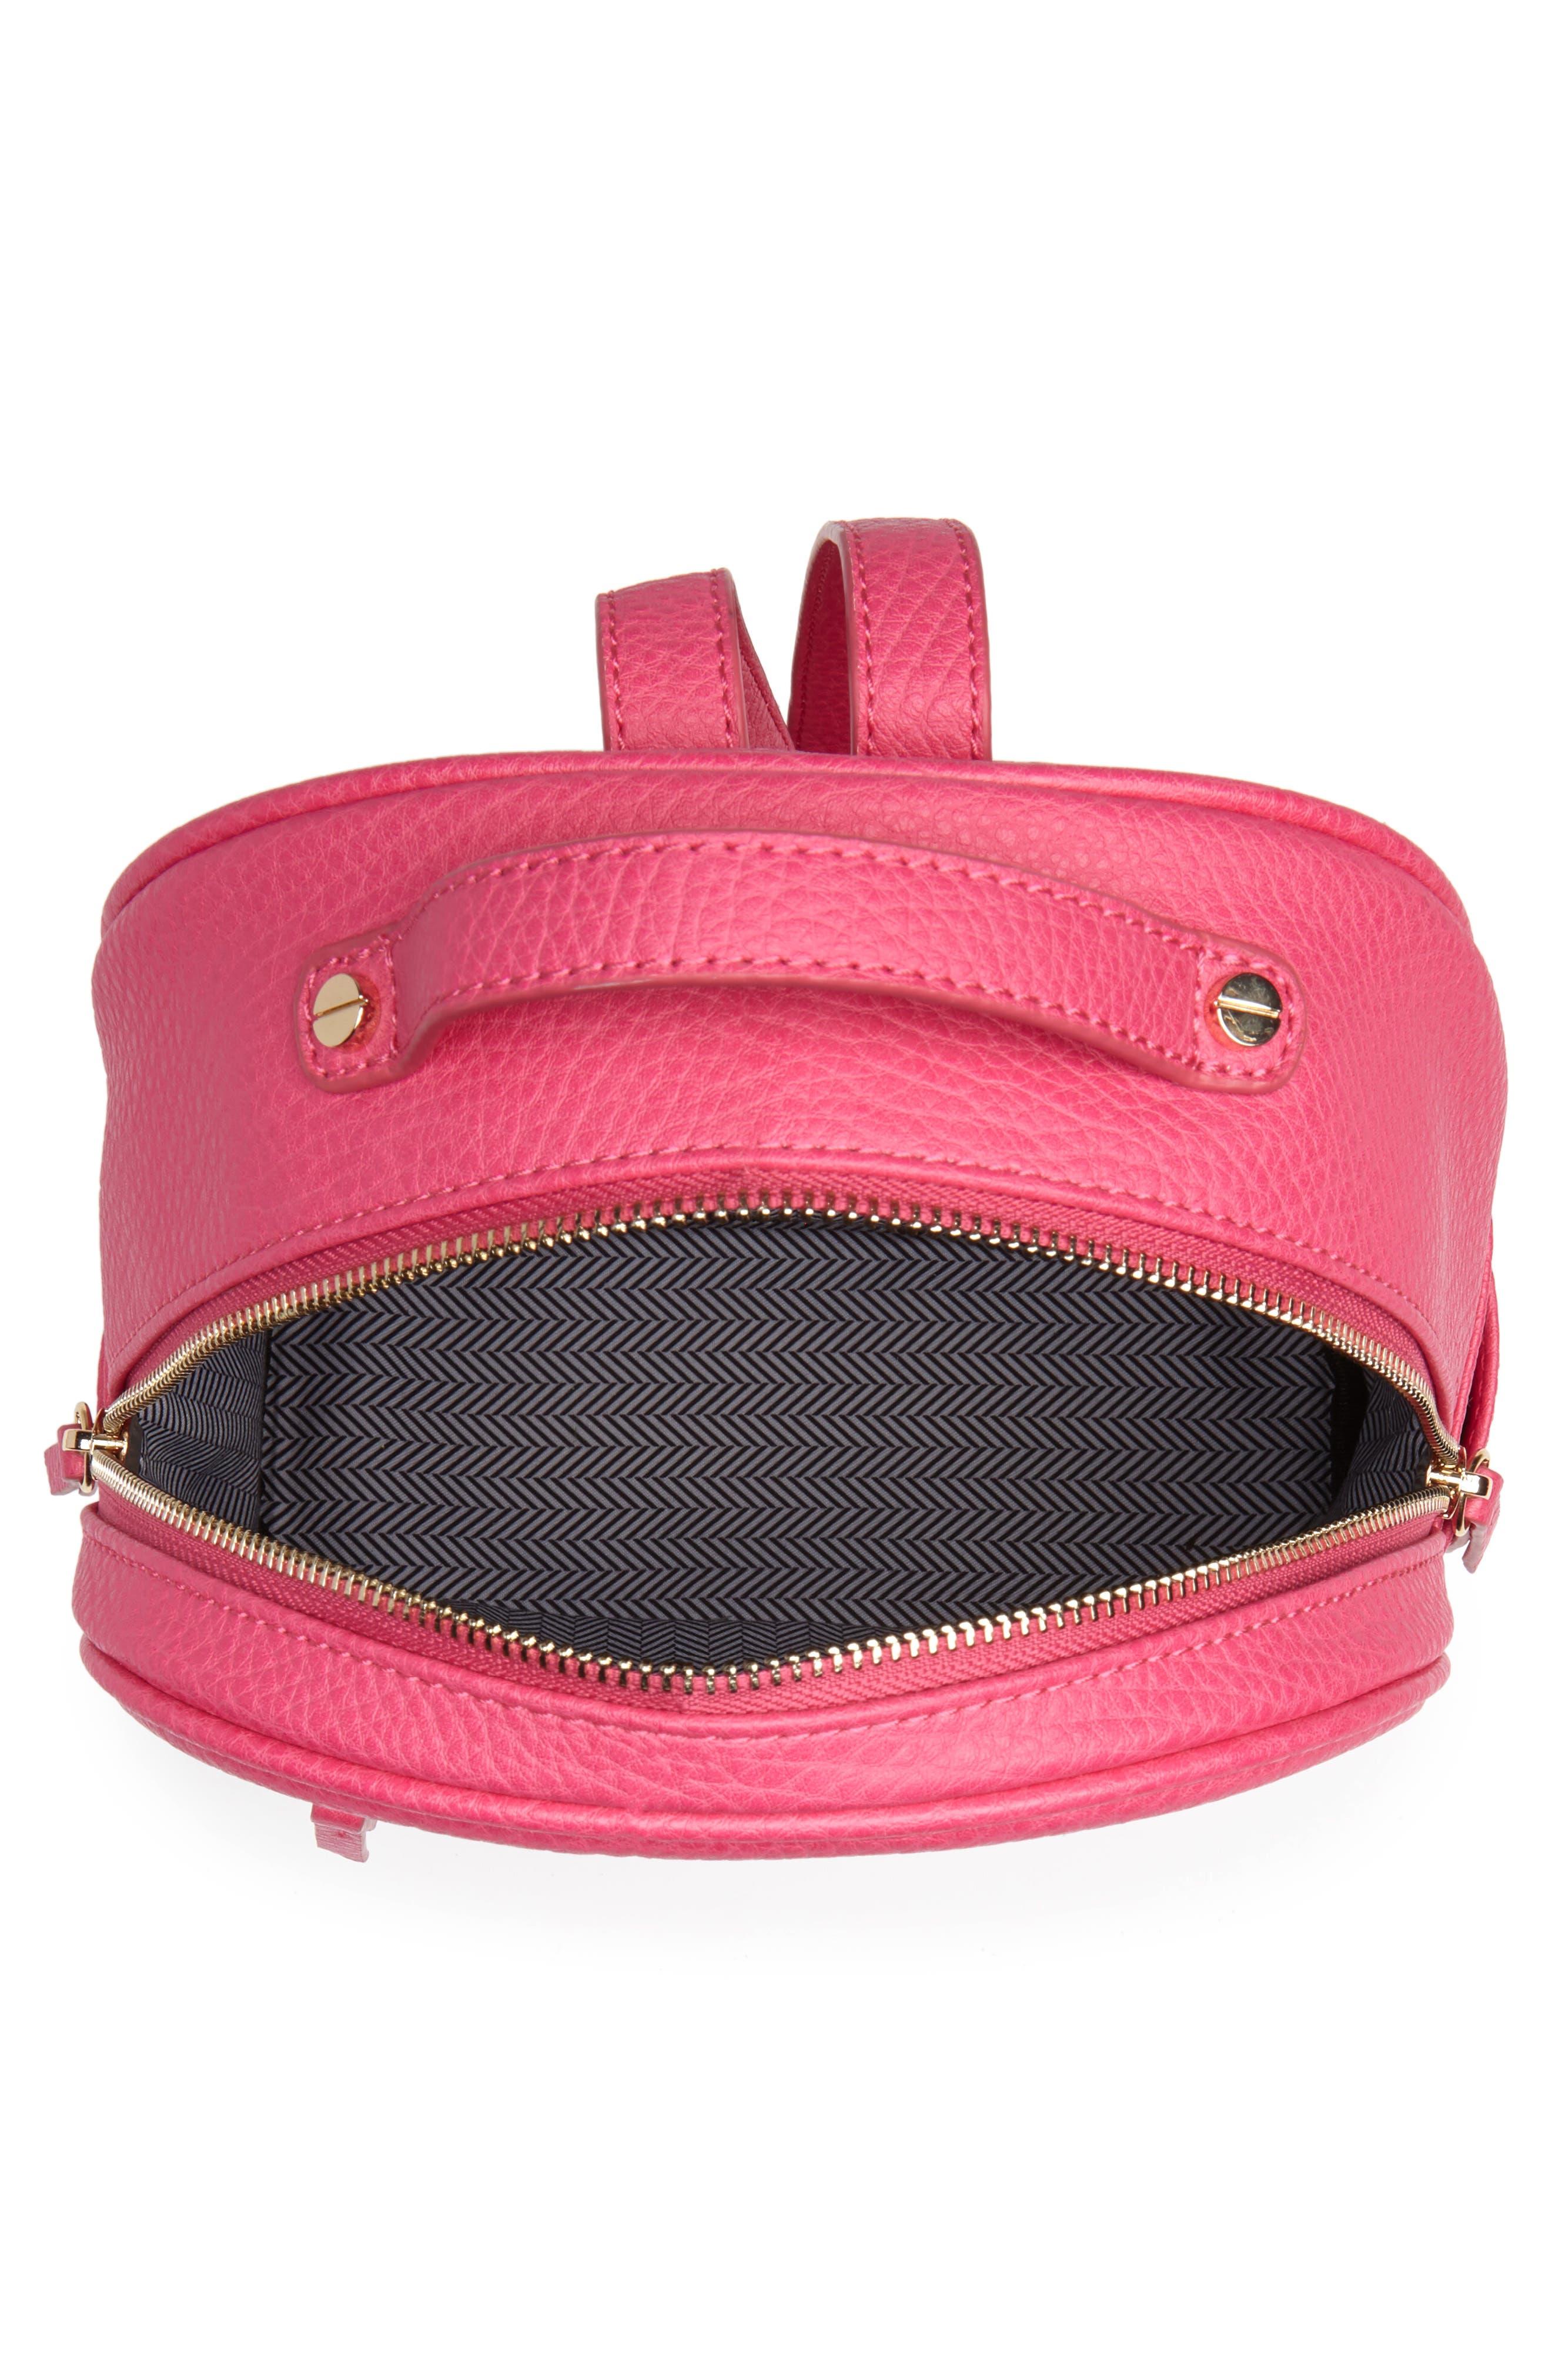 Mali + Lili Hannah Vegan Leather Backpack,                             Alternate thumbnail 4, color,                             Hot Pink